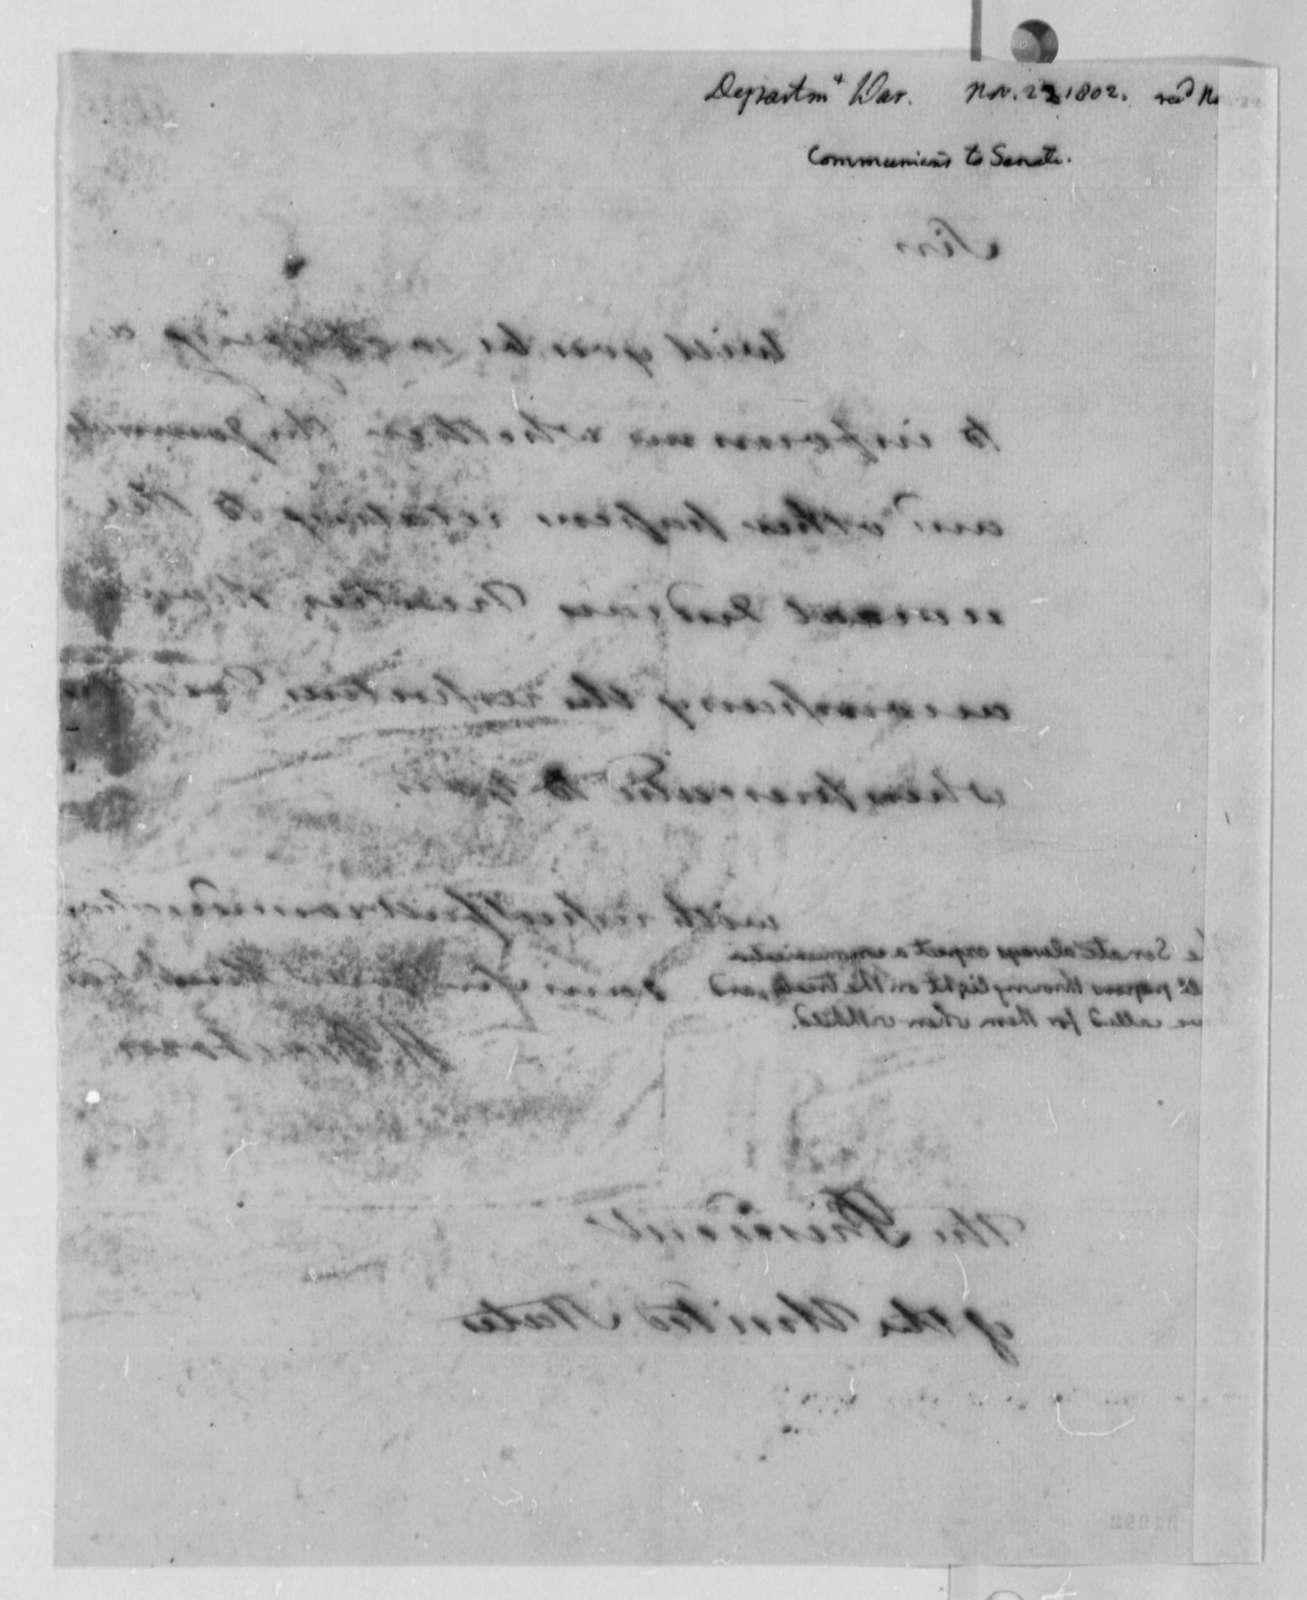 Henry Dearborn to Thomas Jefferson, November 22, 1802